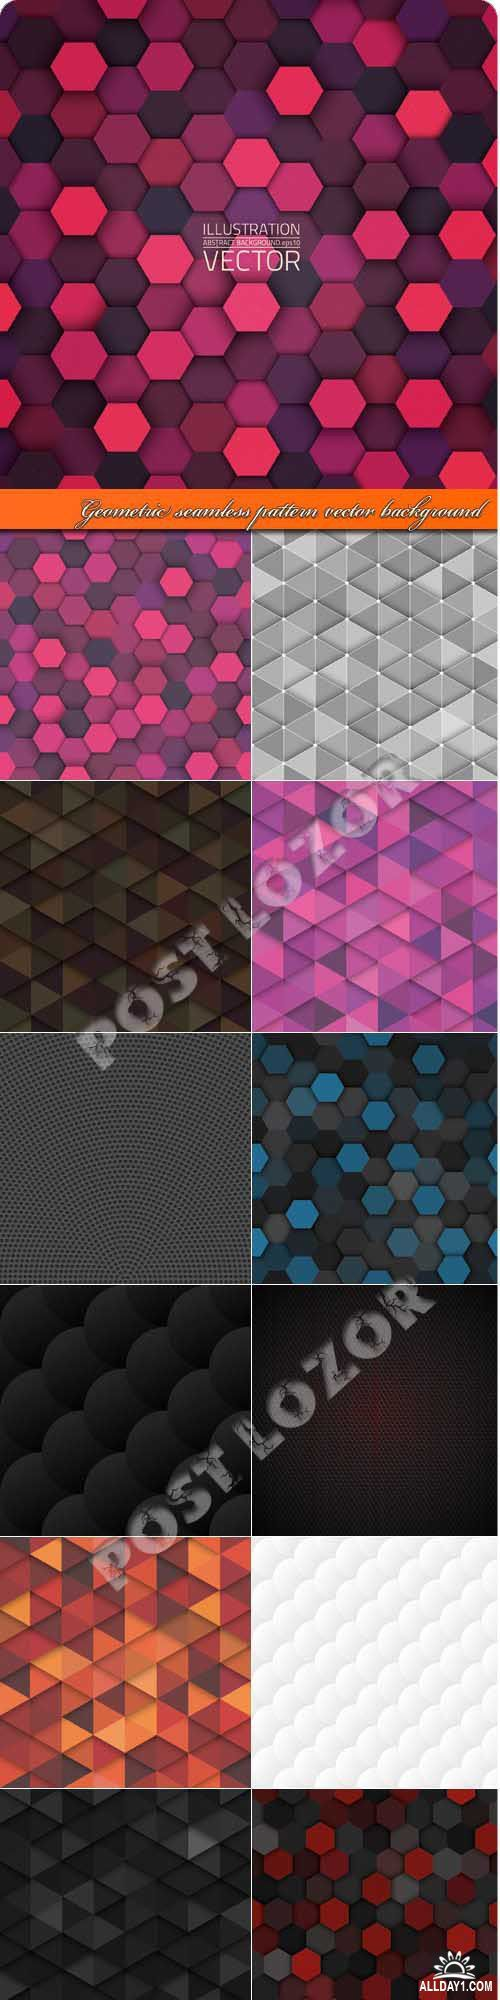 Геометрия узоры бесшовные фоны | Geometric seamless pattern vector background